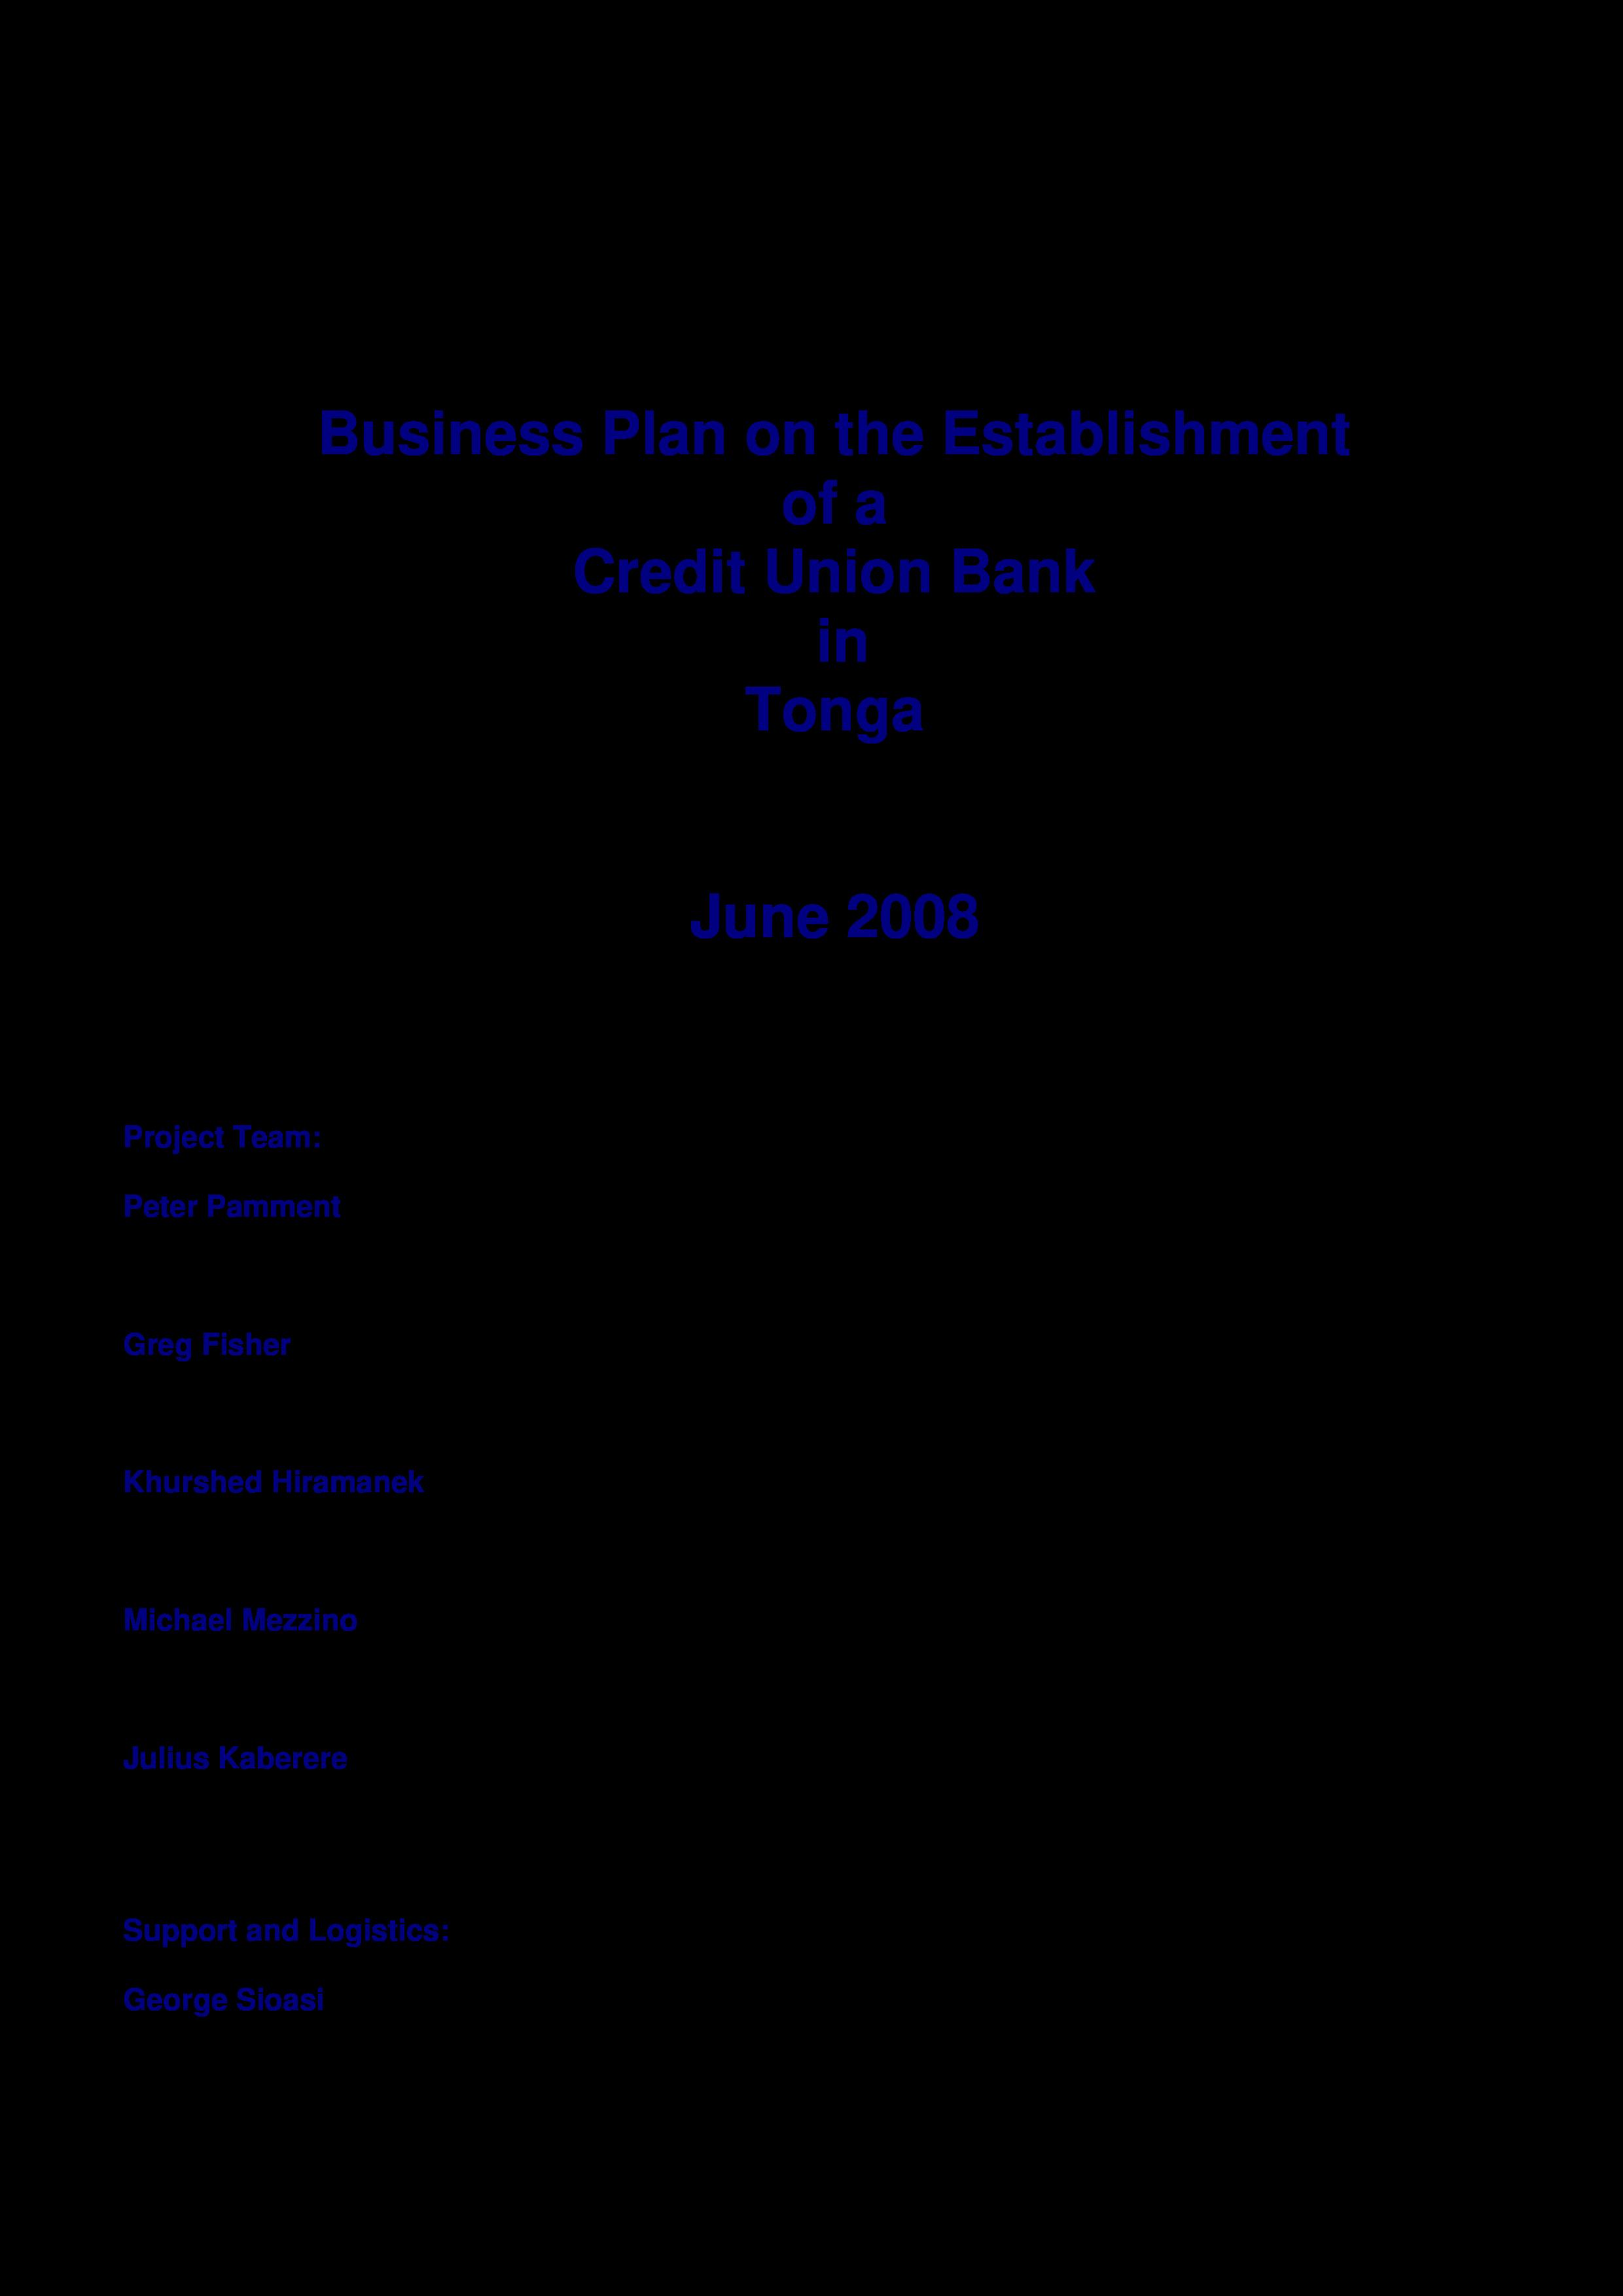 Credit union business plan free sample resort business plan